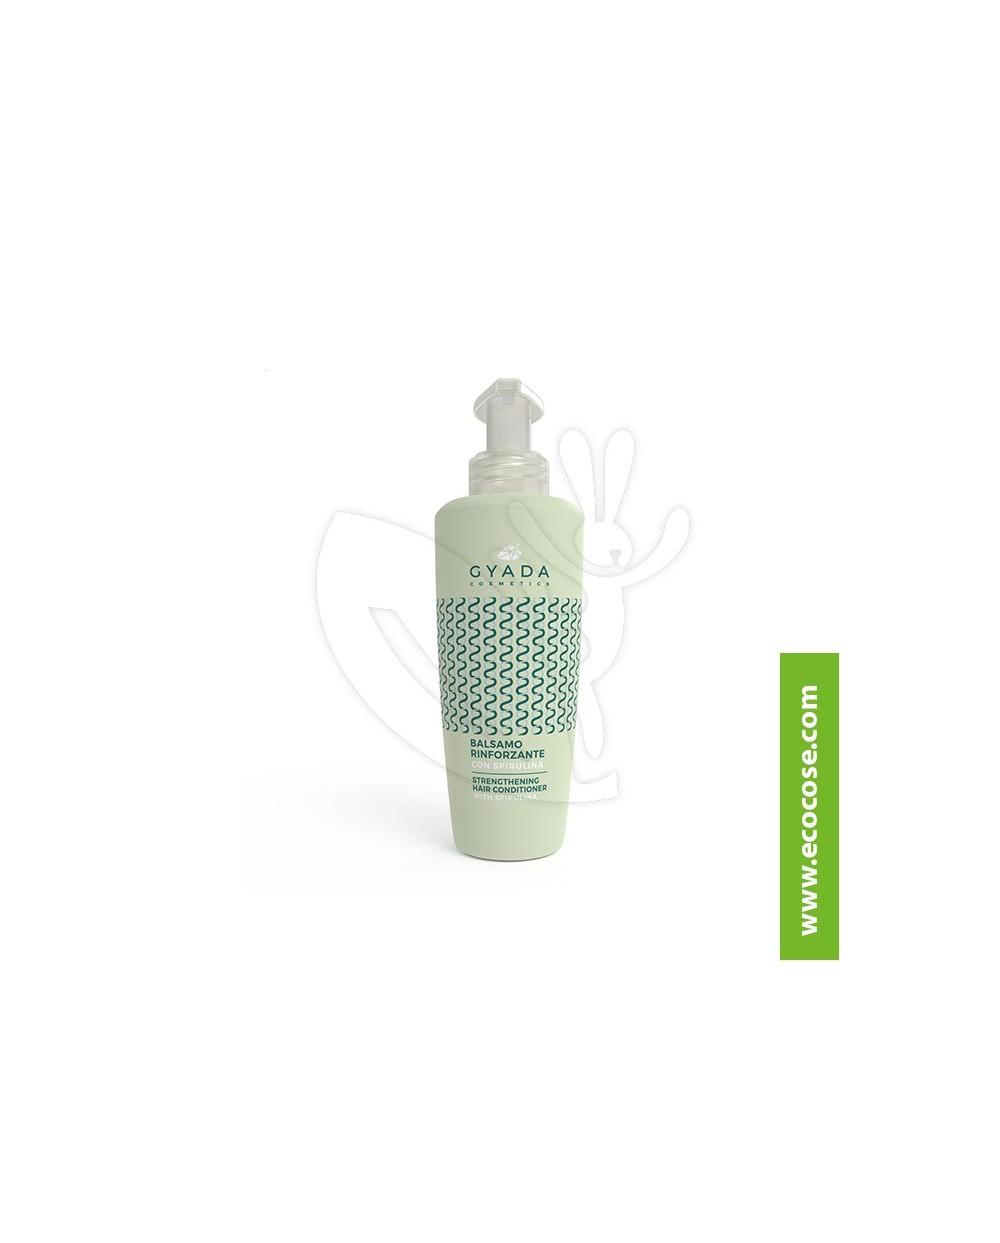 Gyada Cosmetics - Balsamo capelli rinforzante con spirulina